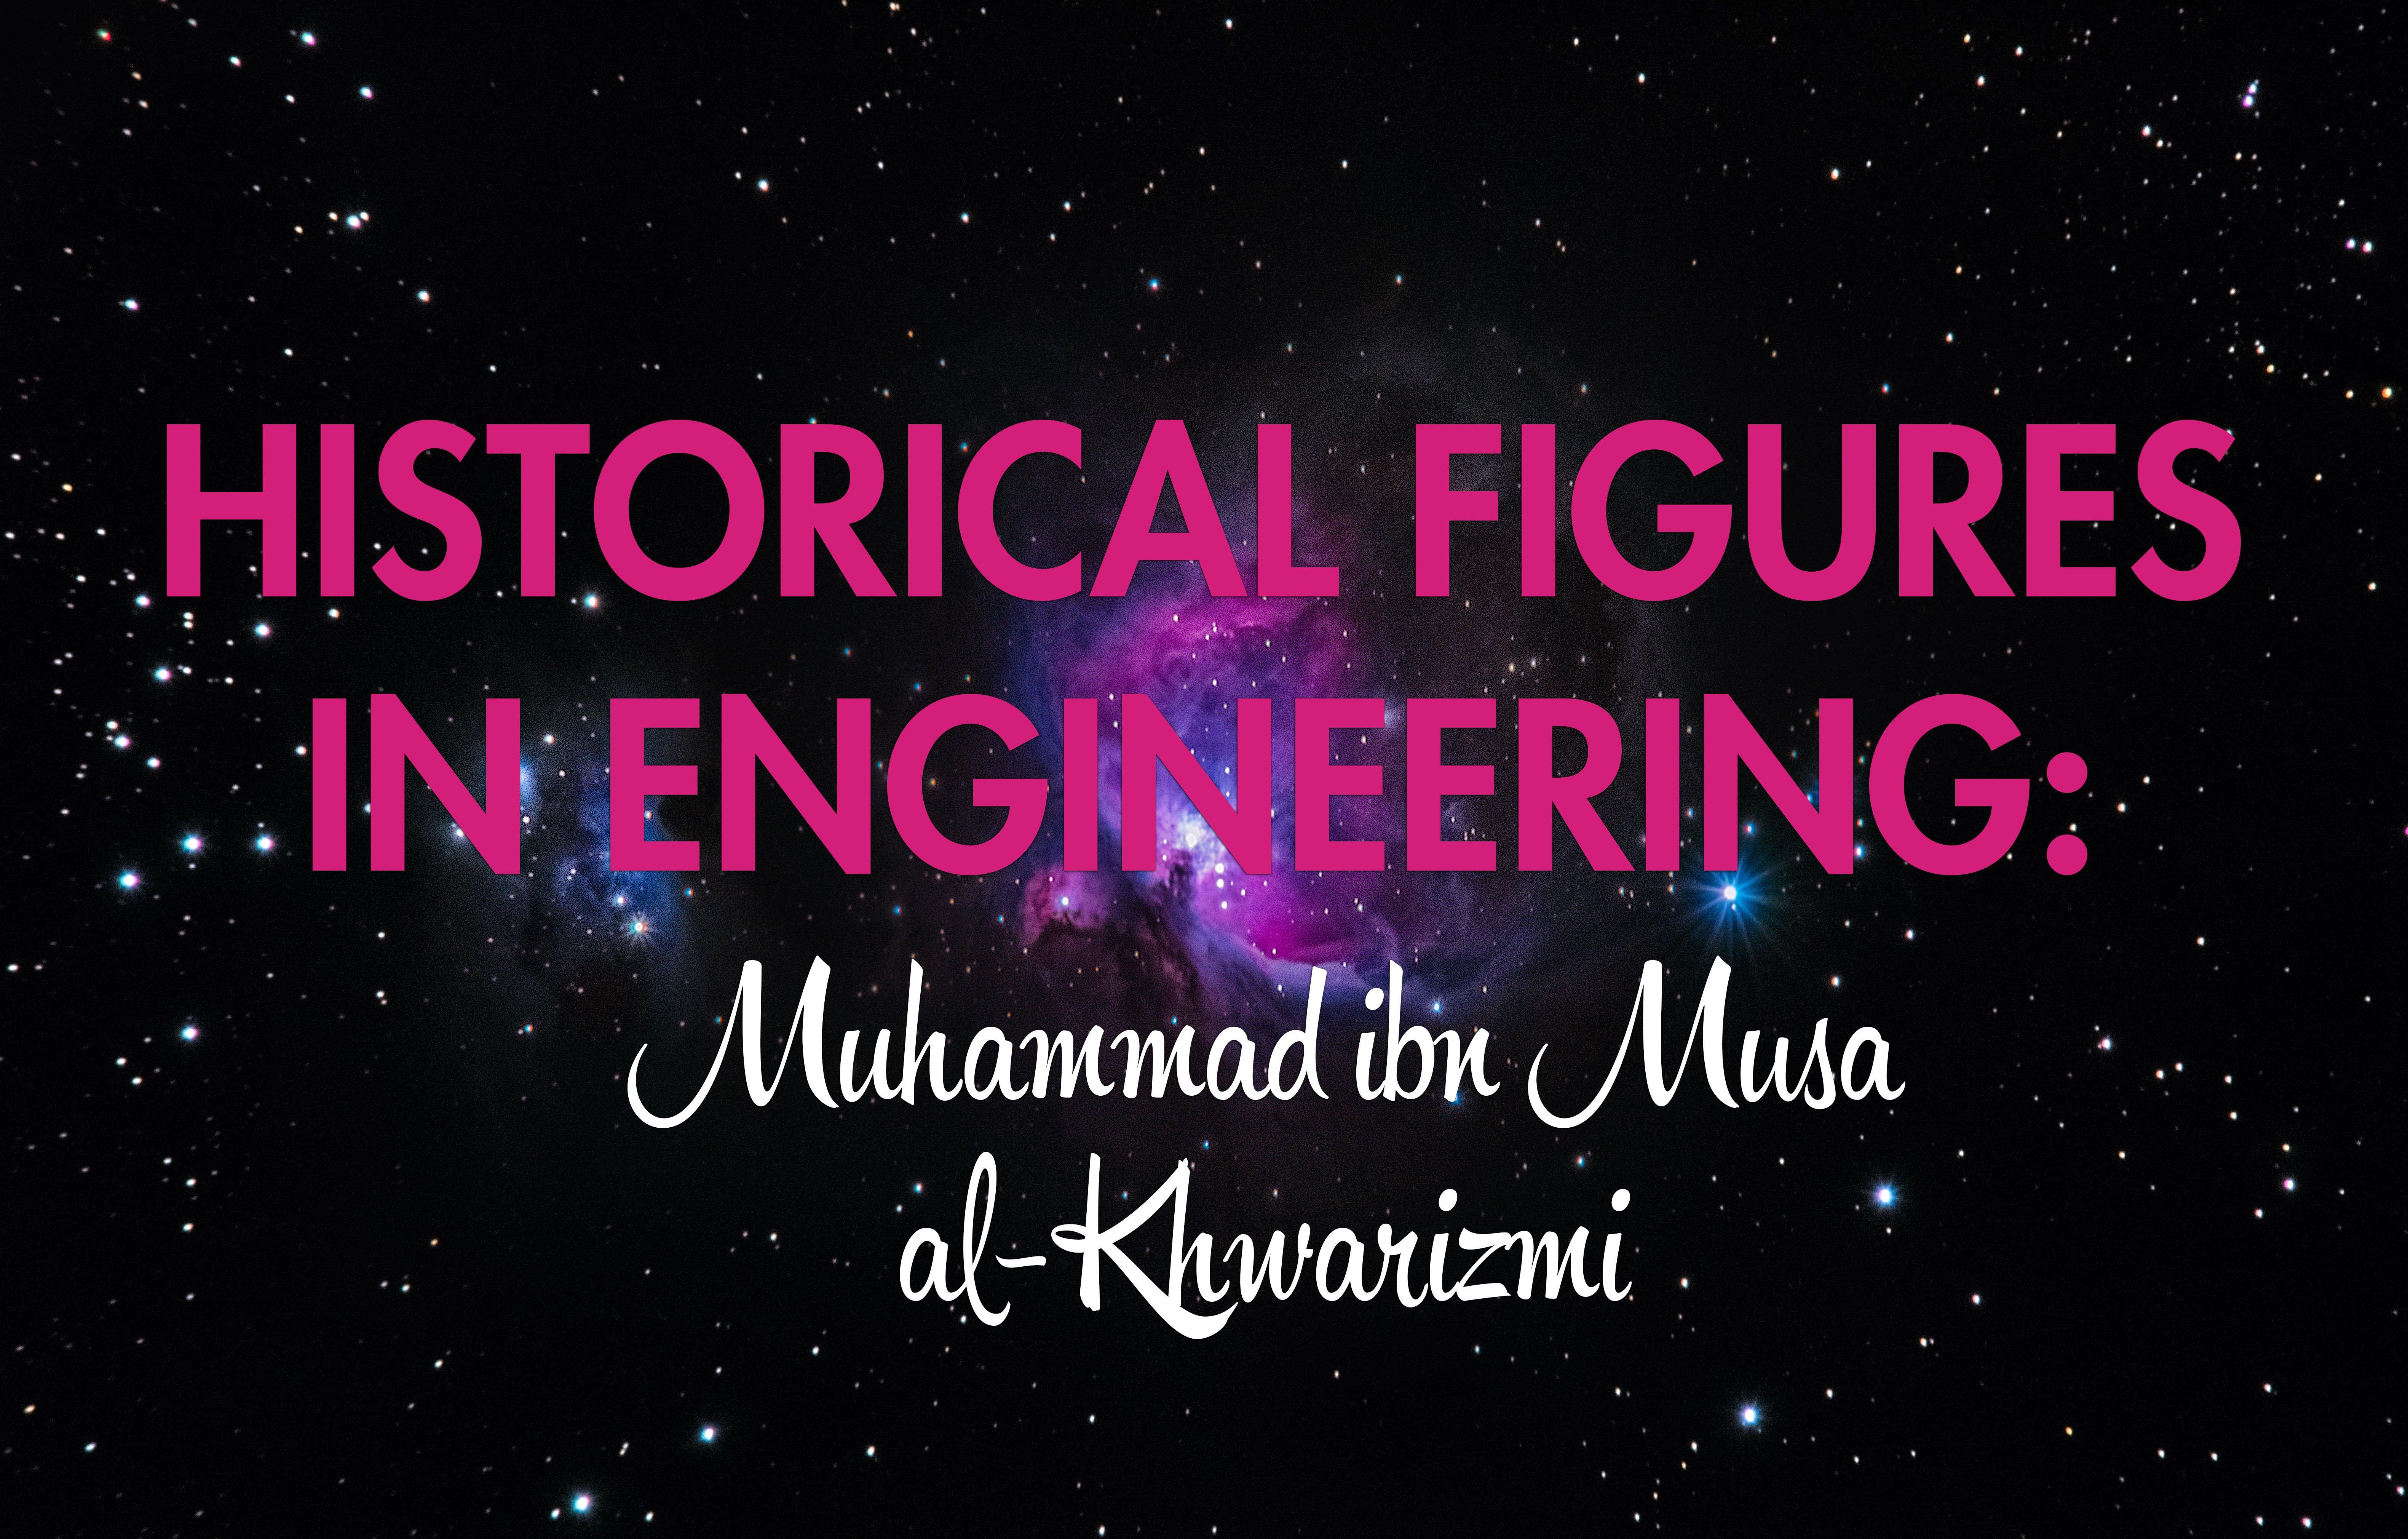 historical figures in engineering- muhammad ibn musa al-khwarizimi